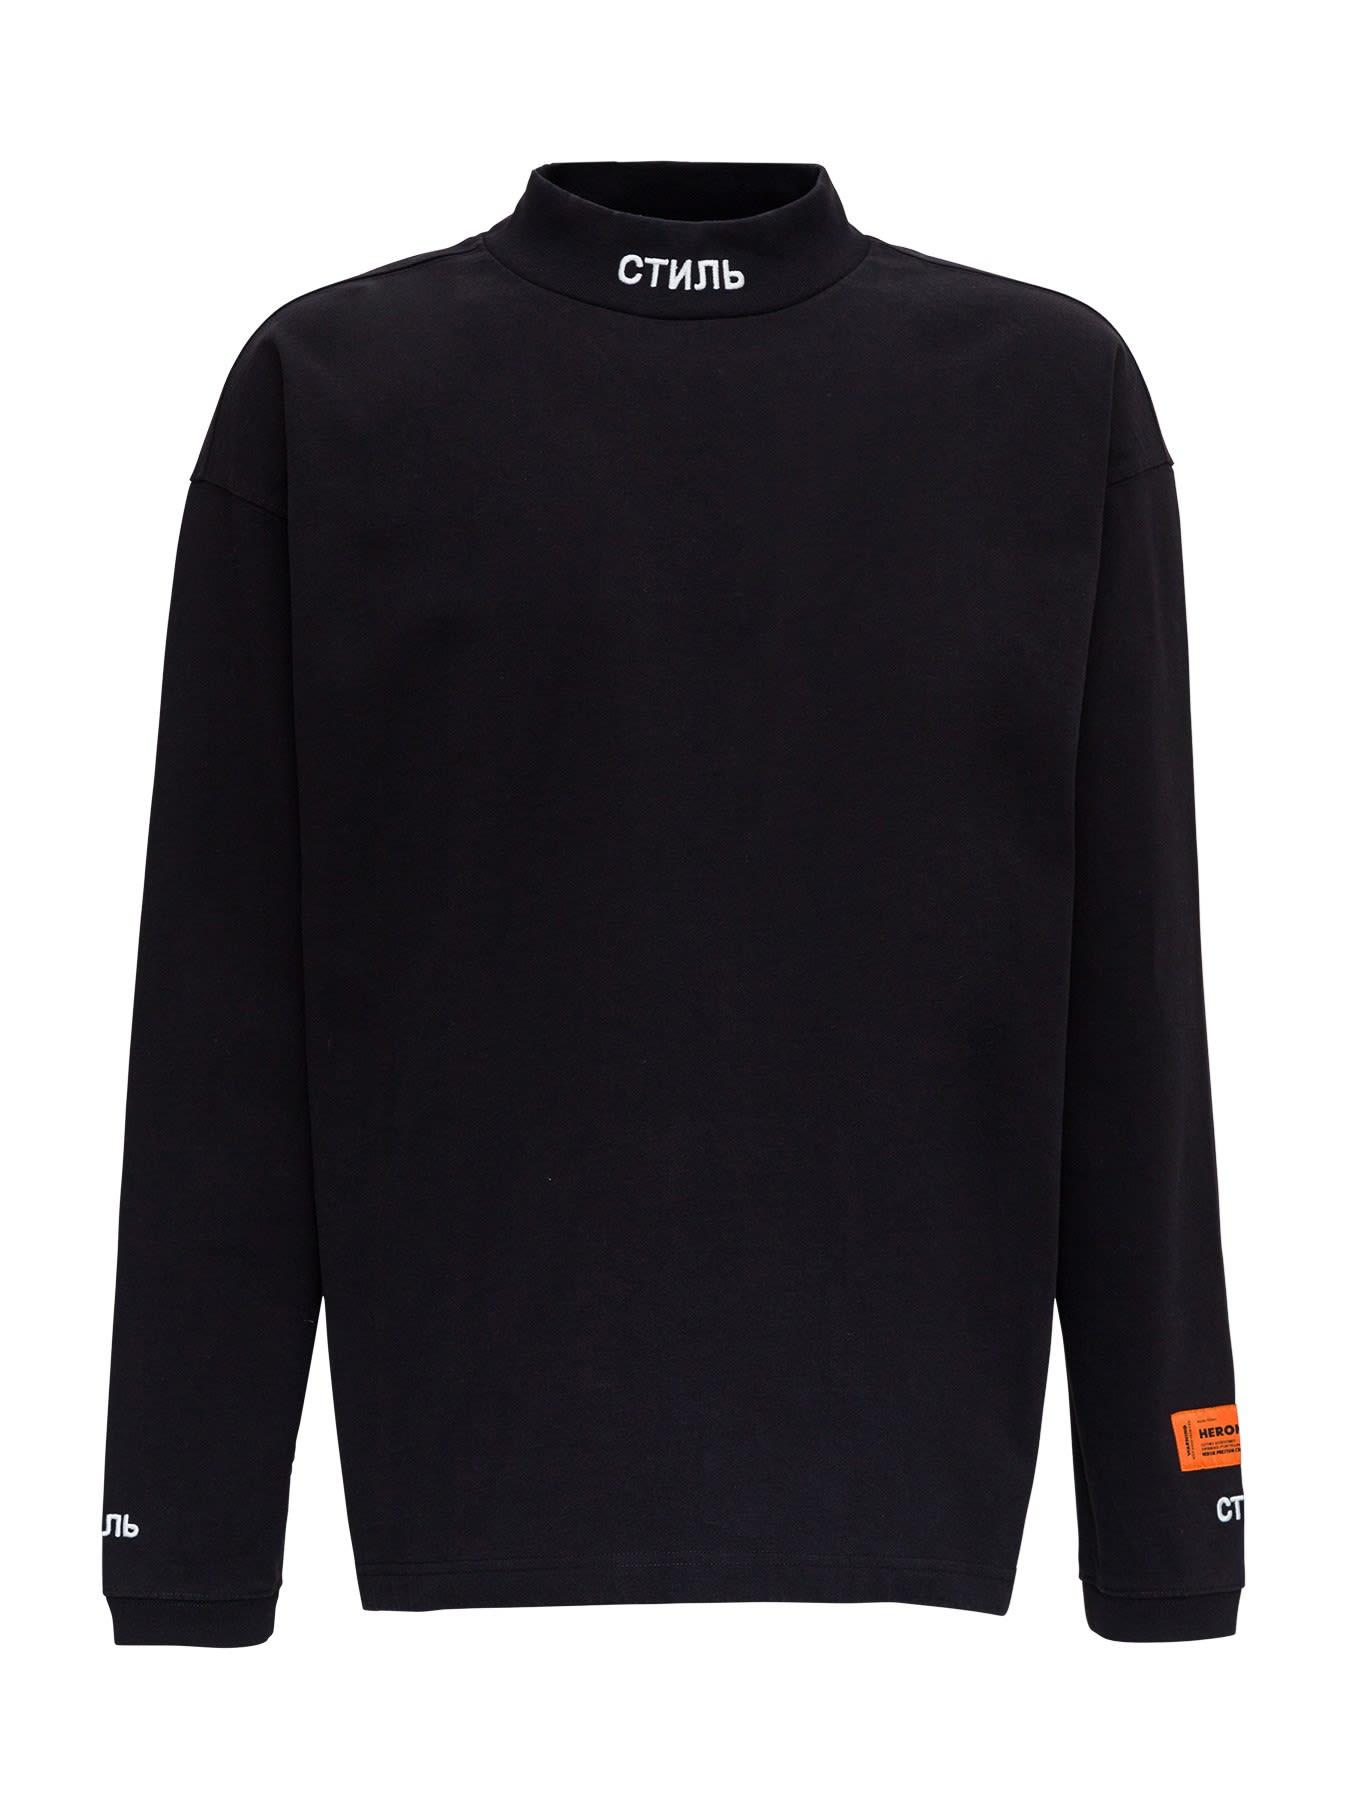 HERON PRESTON Ctnmnb Sweatshirt